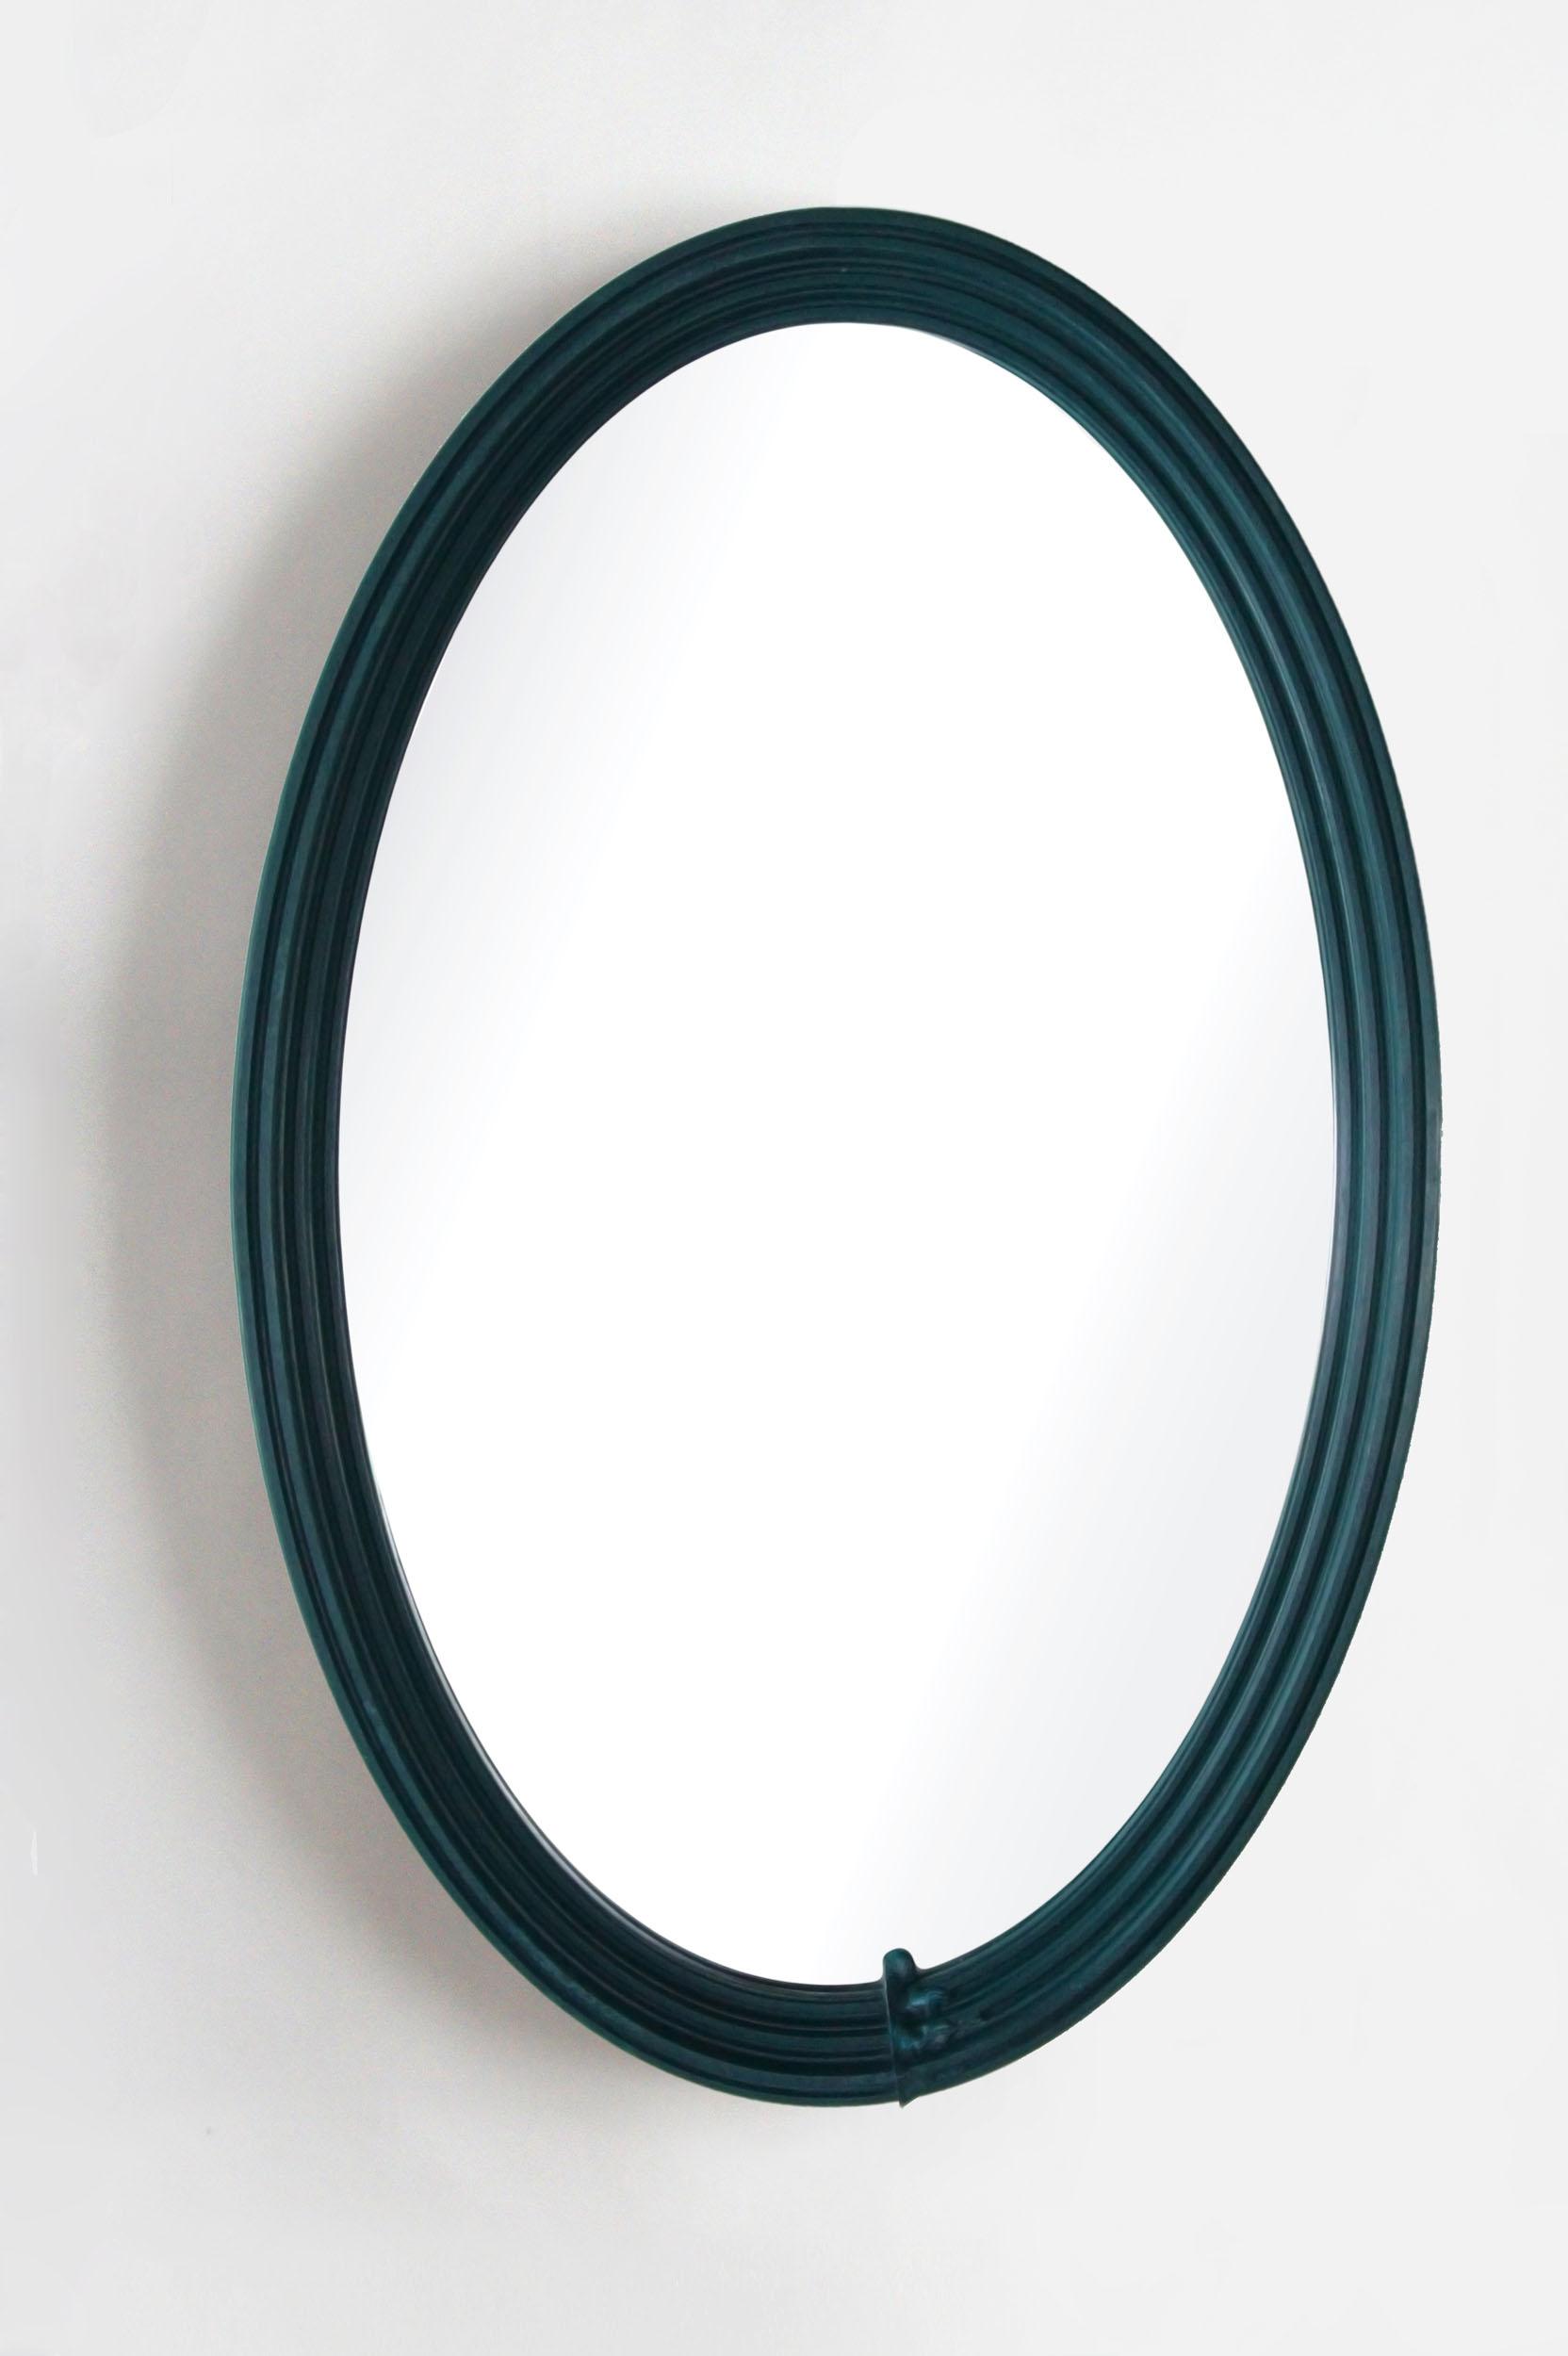 An elliptical Bench Mould mirror in dark blue